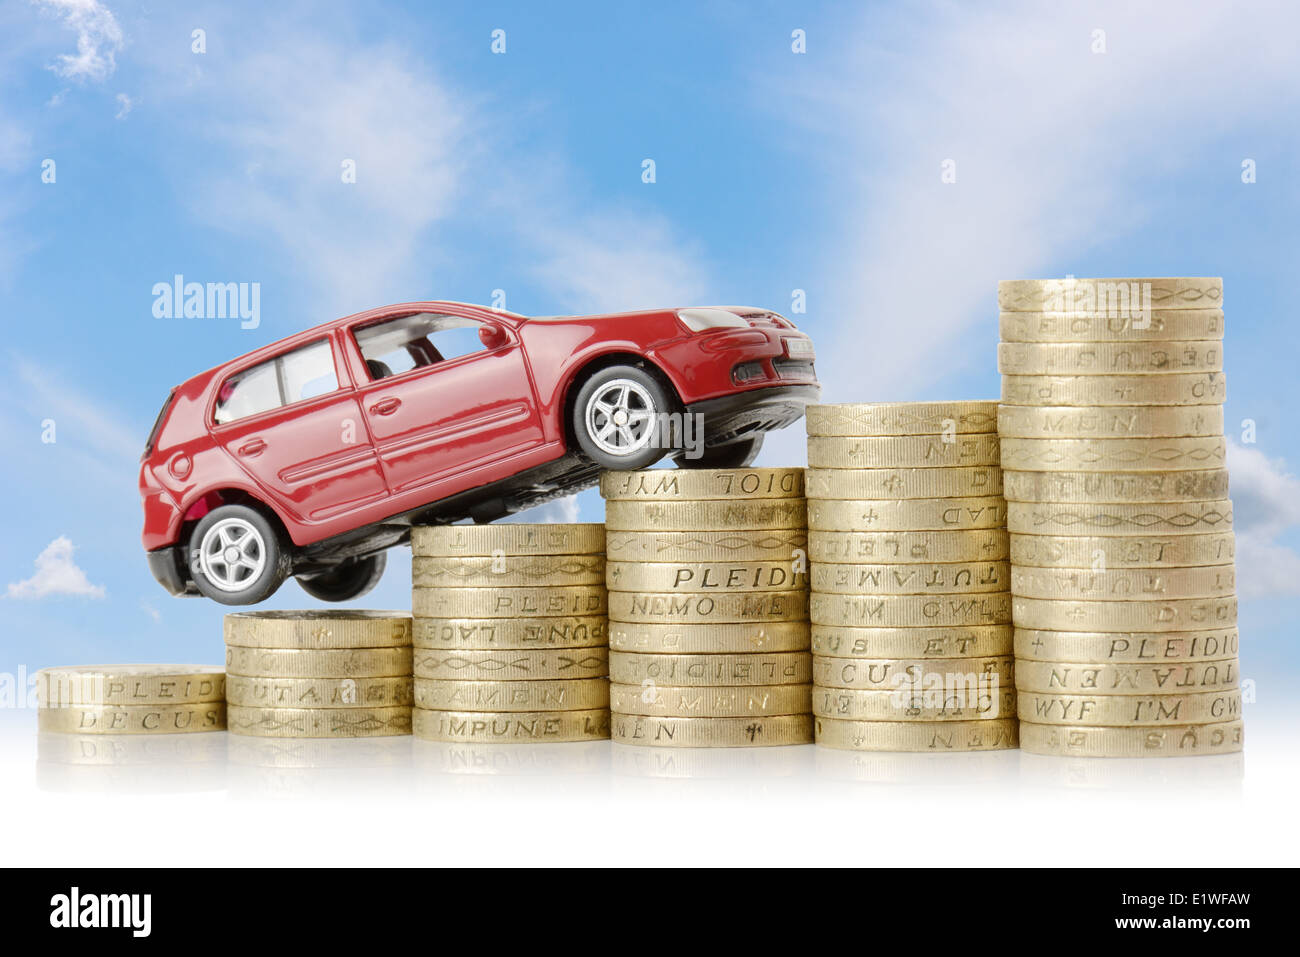 Car Insurance Stockfotos & Car Insurance Bilder - Alamy